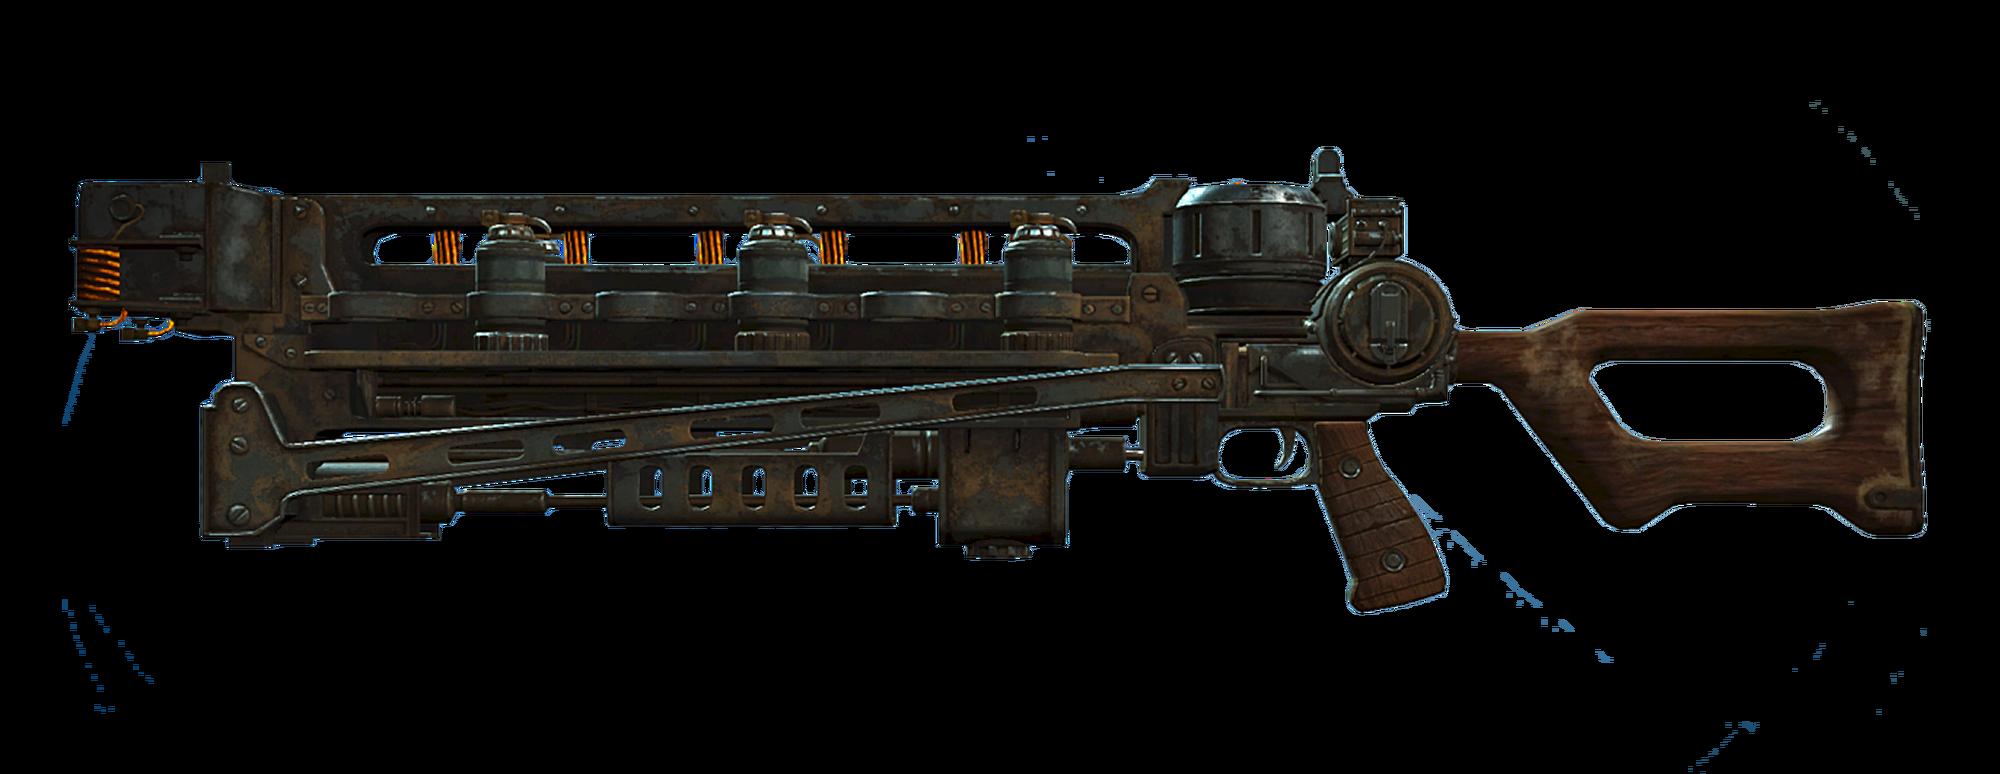 Gauss rifle (Fallout 4)   Fallout Wiki   FANDOM powered by Wikia